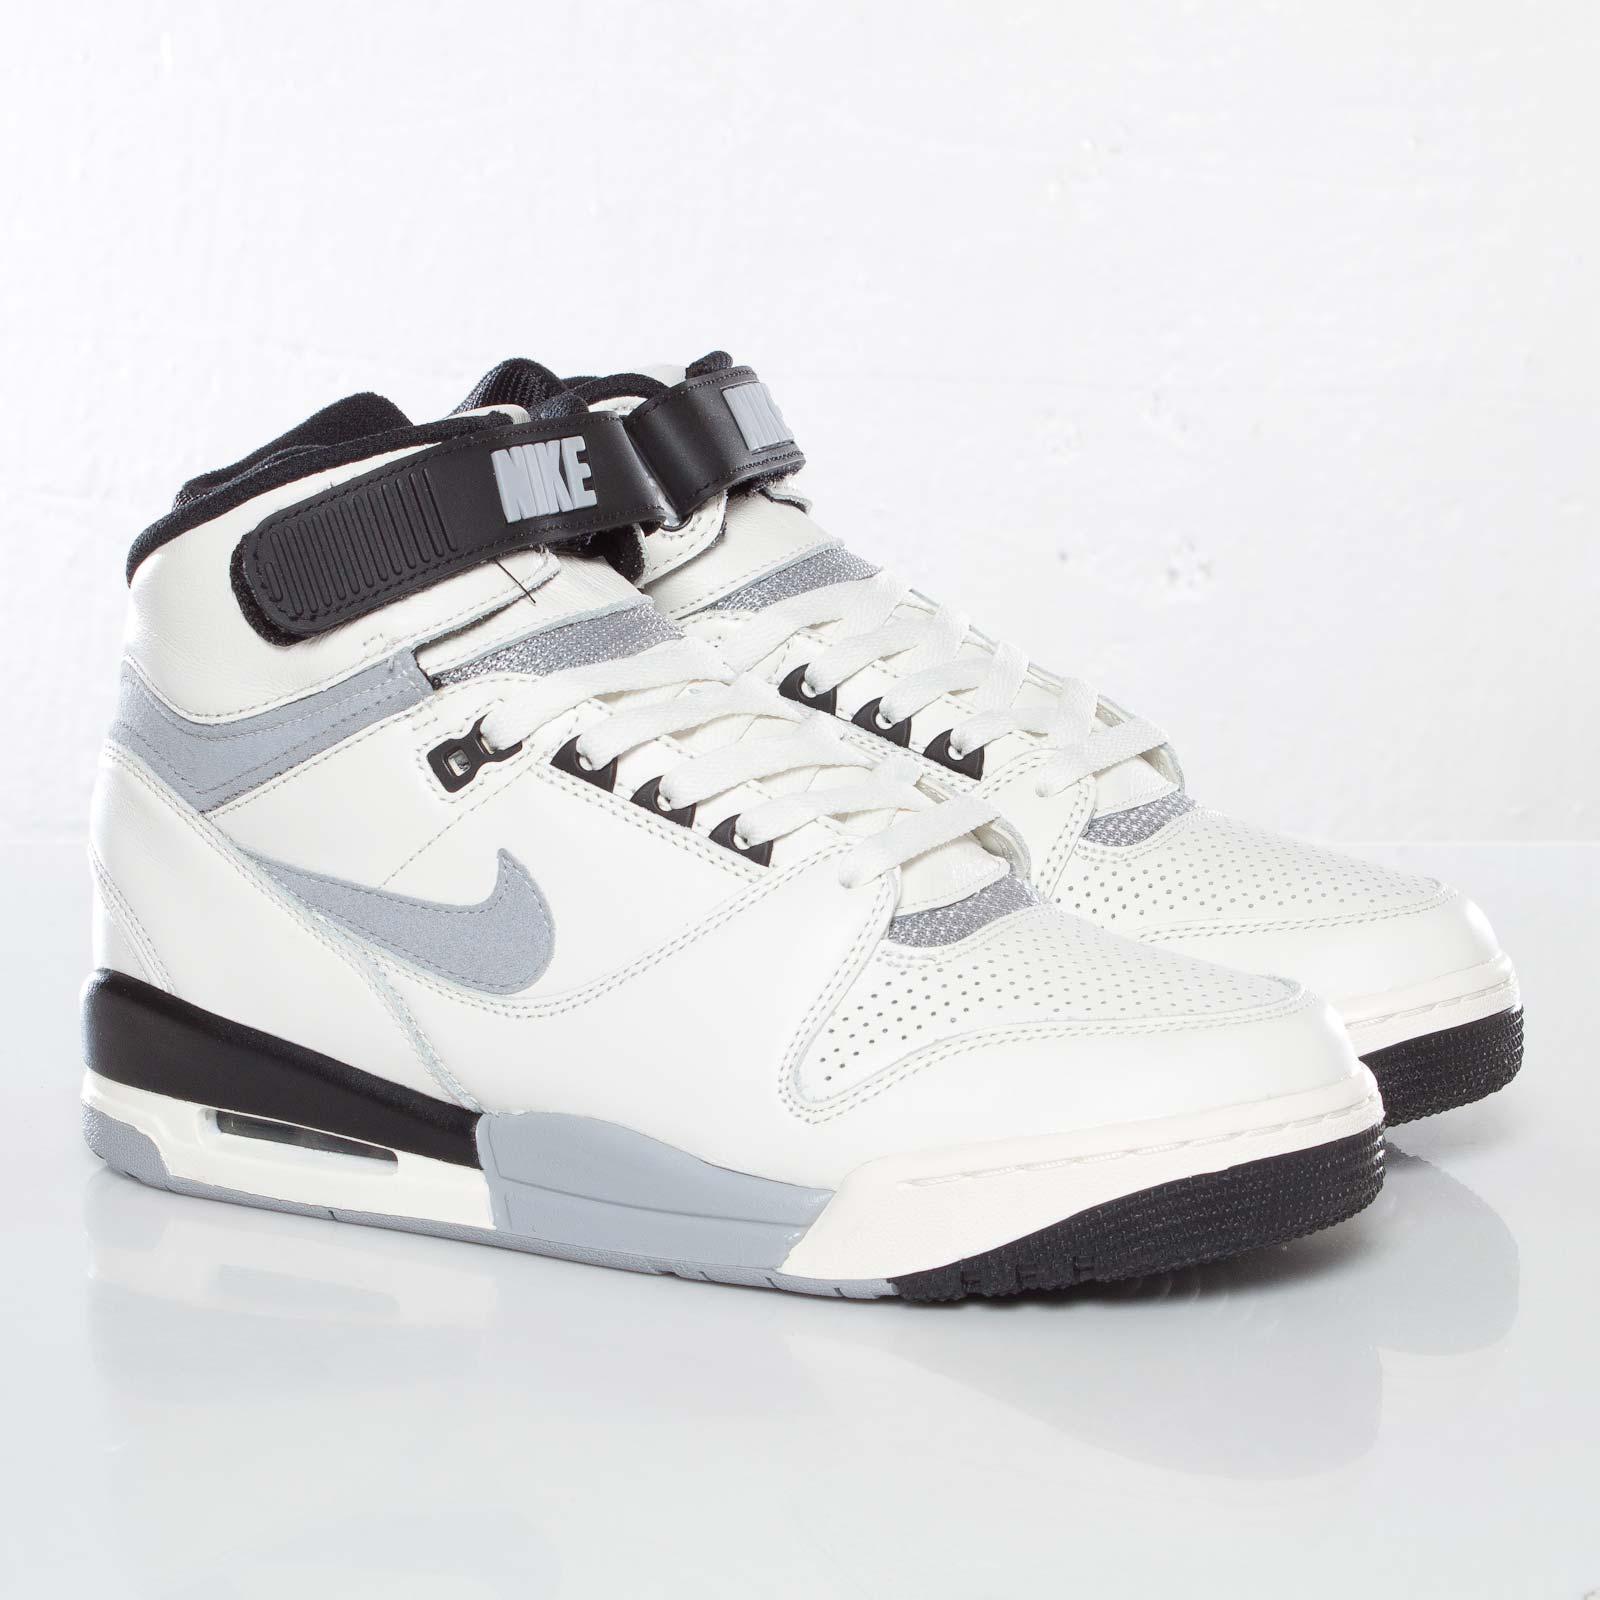 0f8e41b7682a Nike Air Revolution Vintage QS - 617855-100 - Sneakersnstuff ...